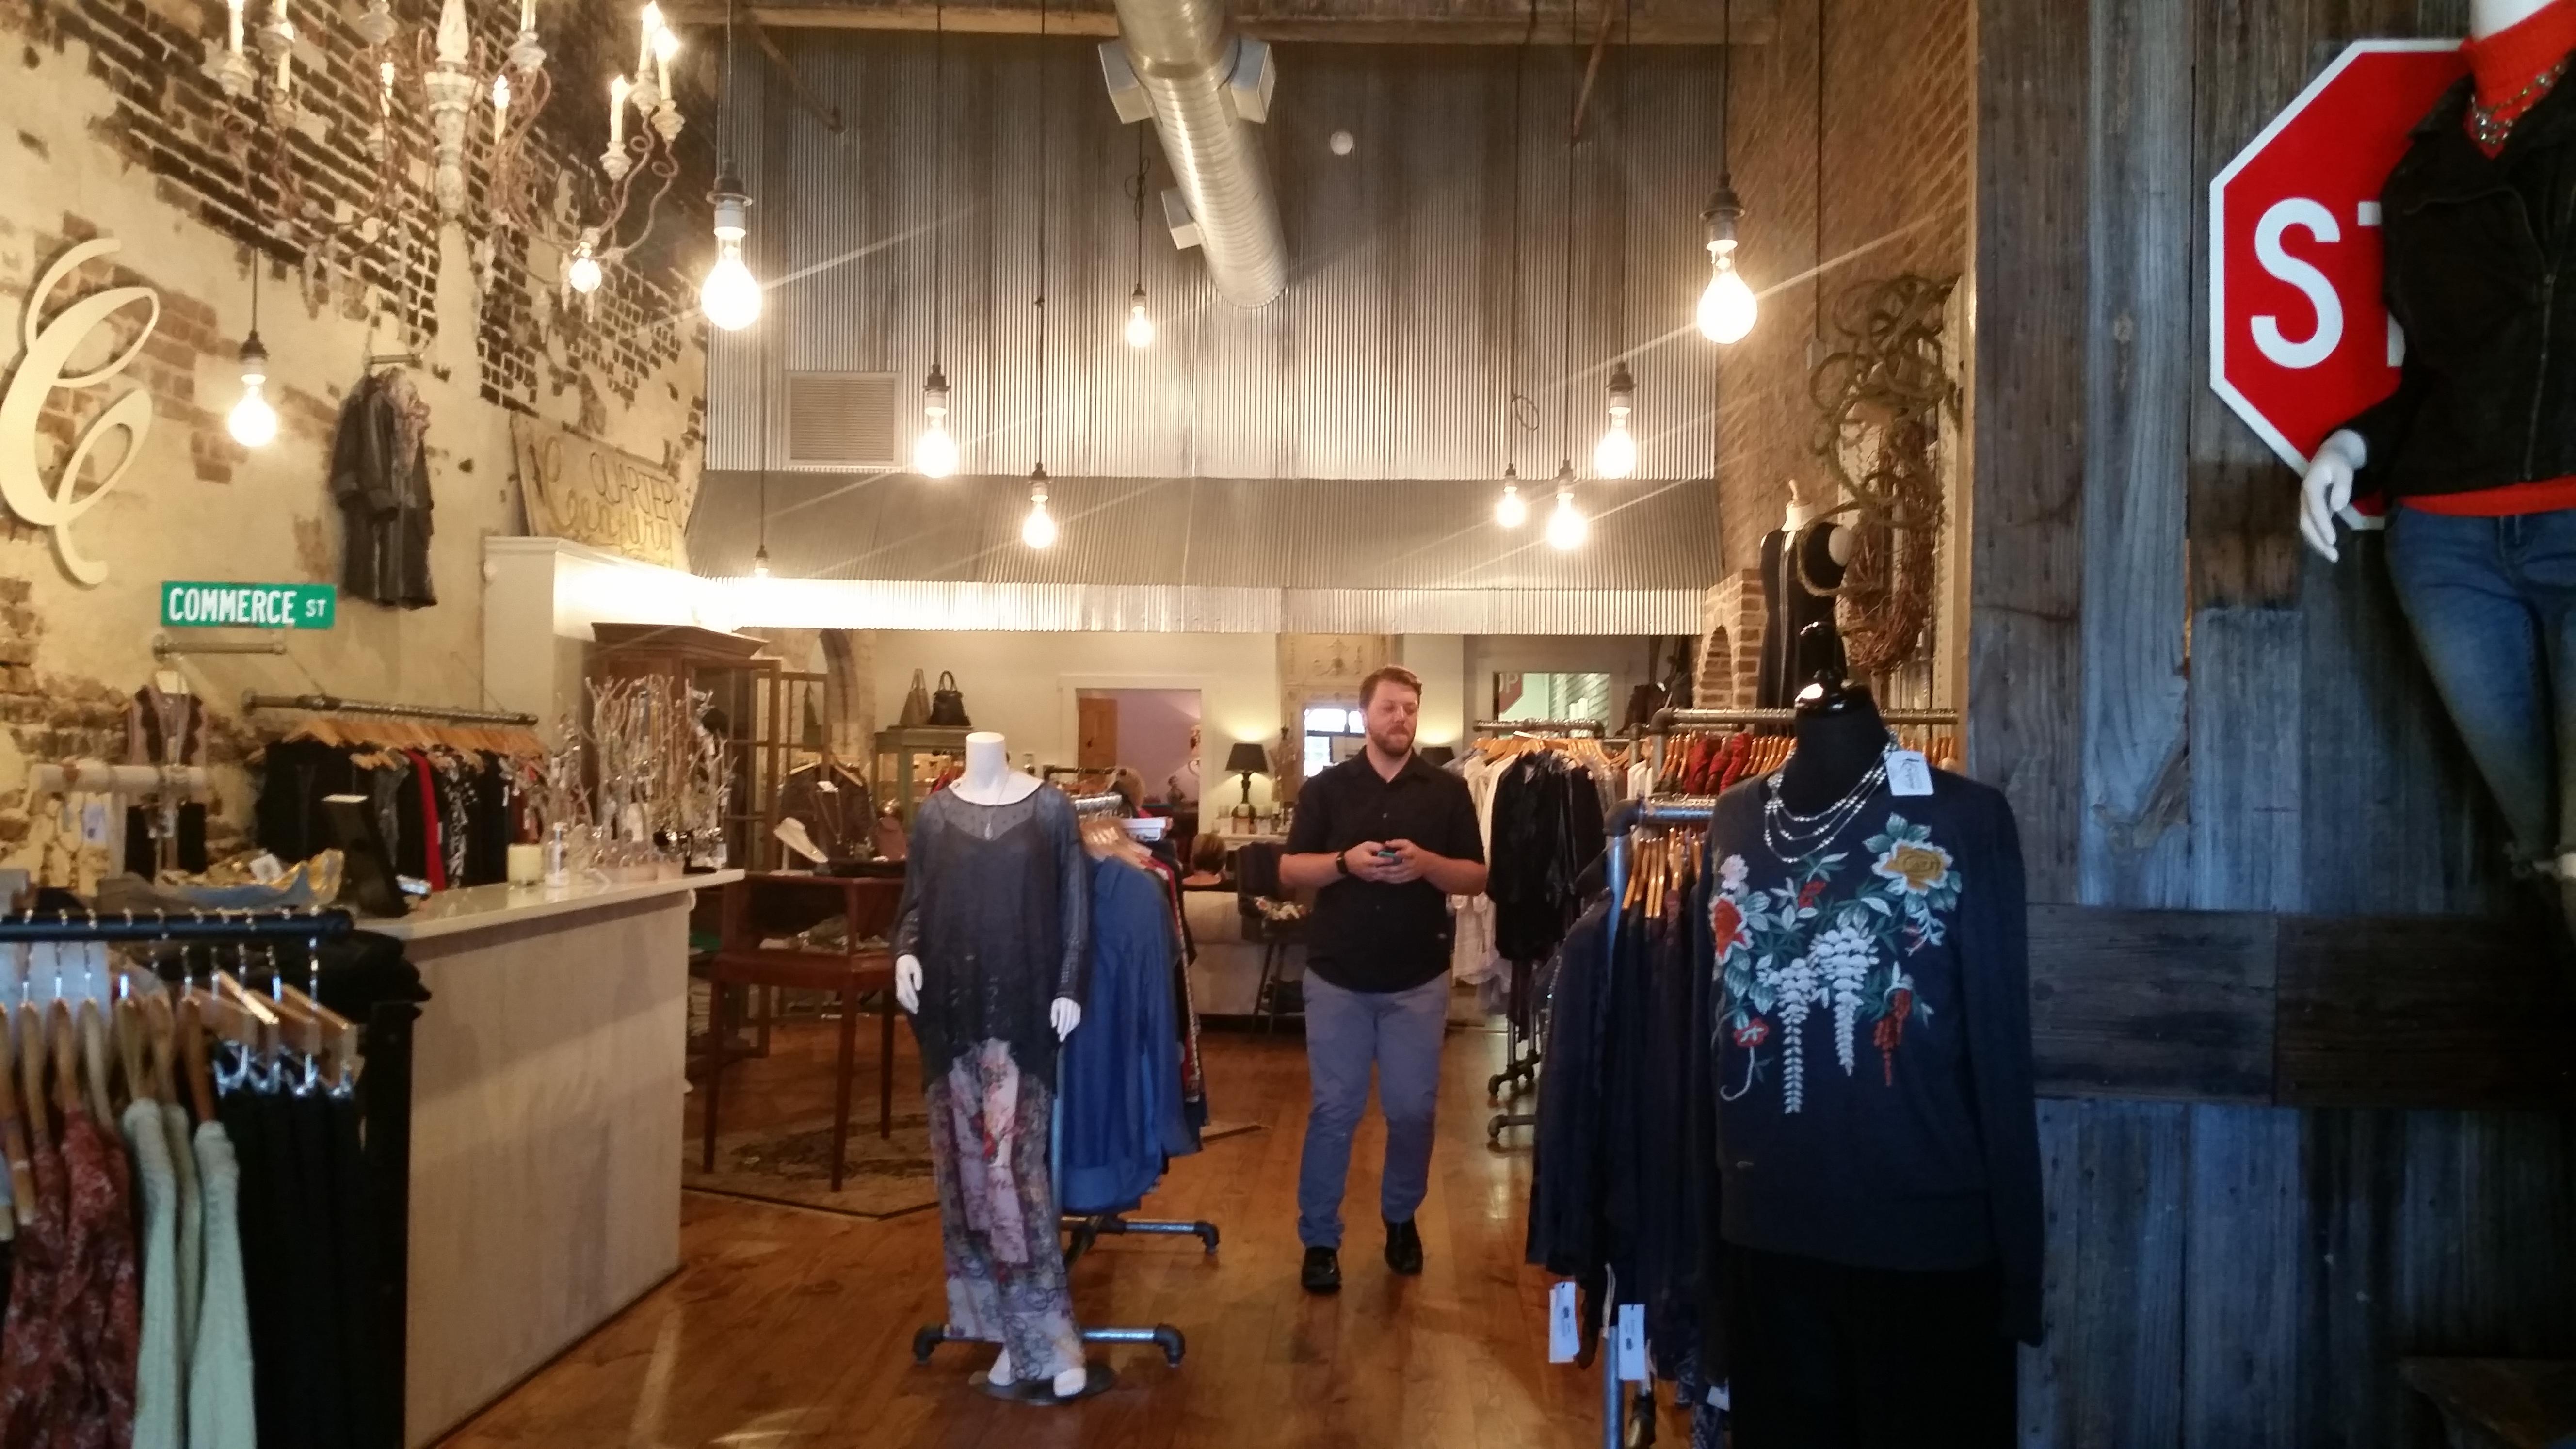 Clothing stores in hattiesburg ms